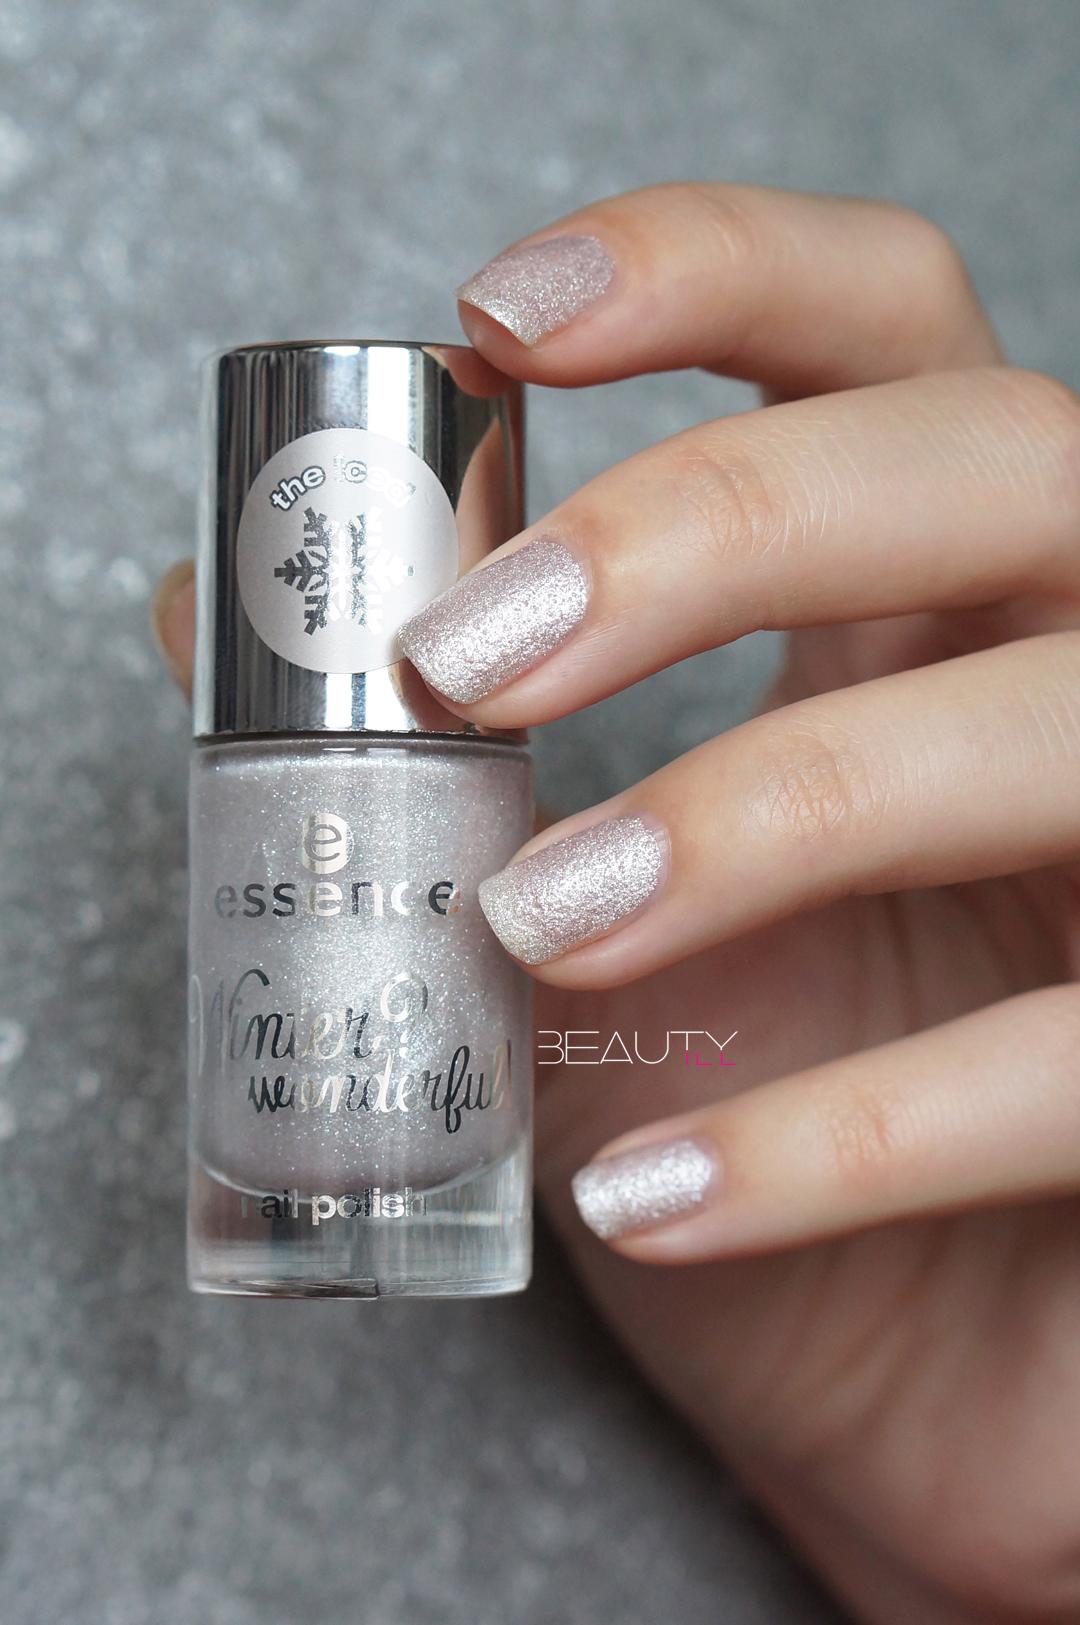 Essence Winter? Wonderful! nail polish